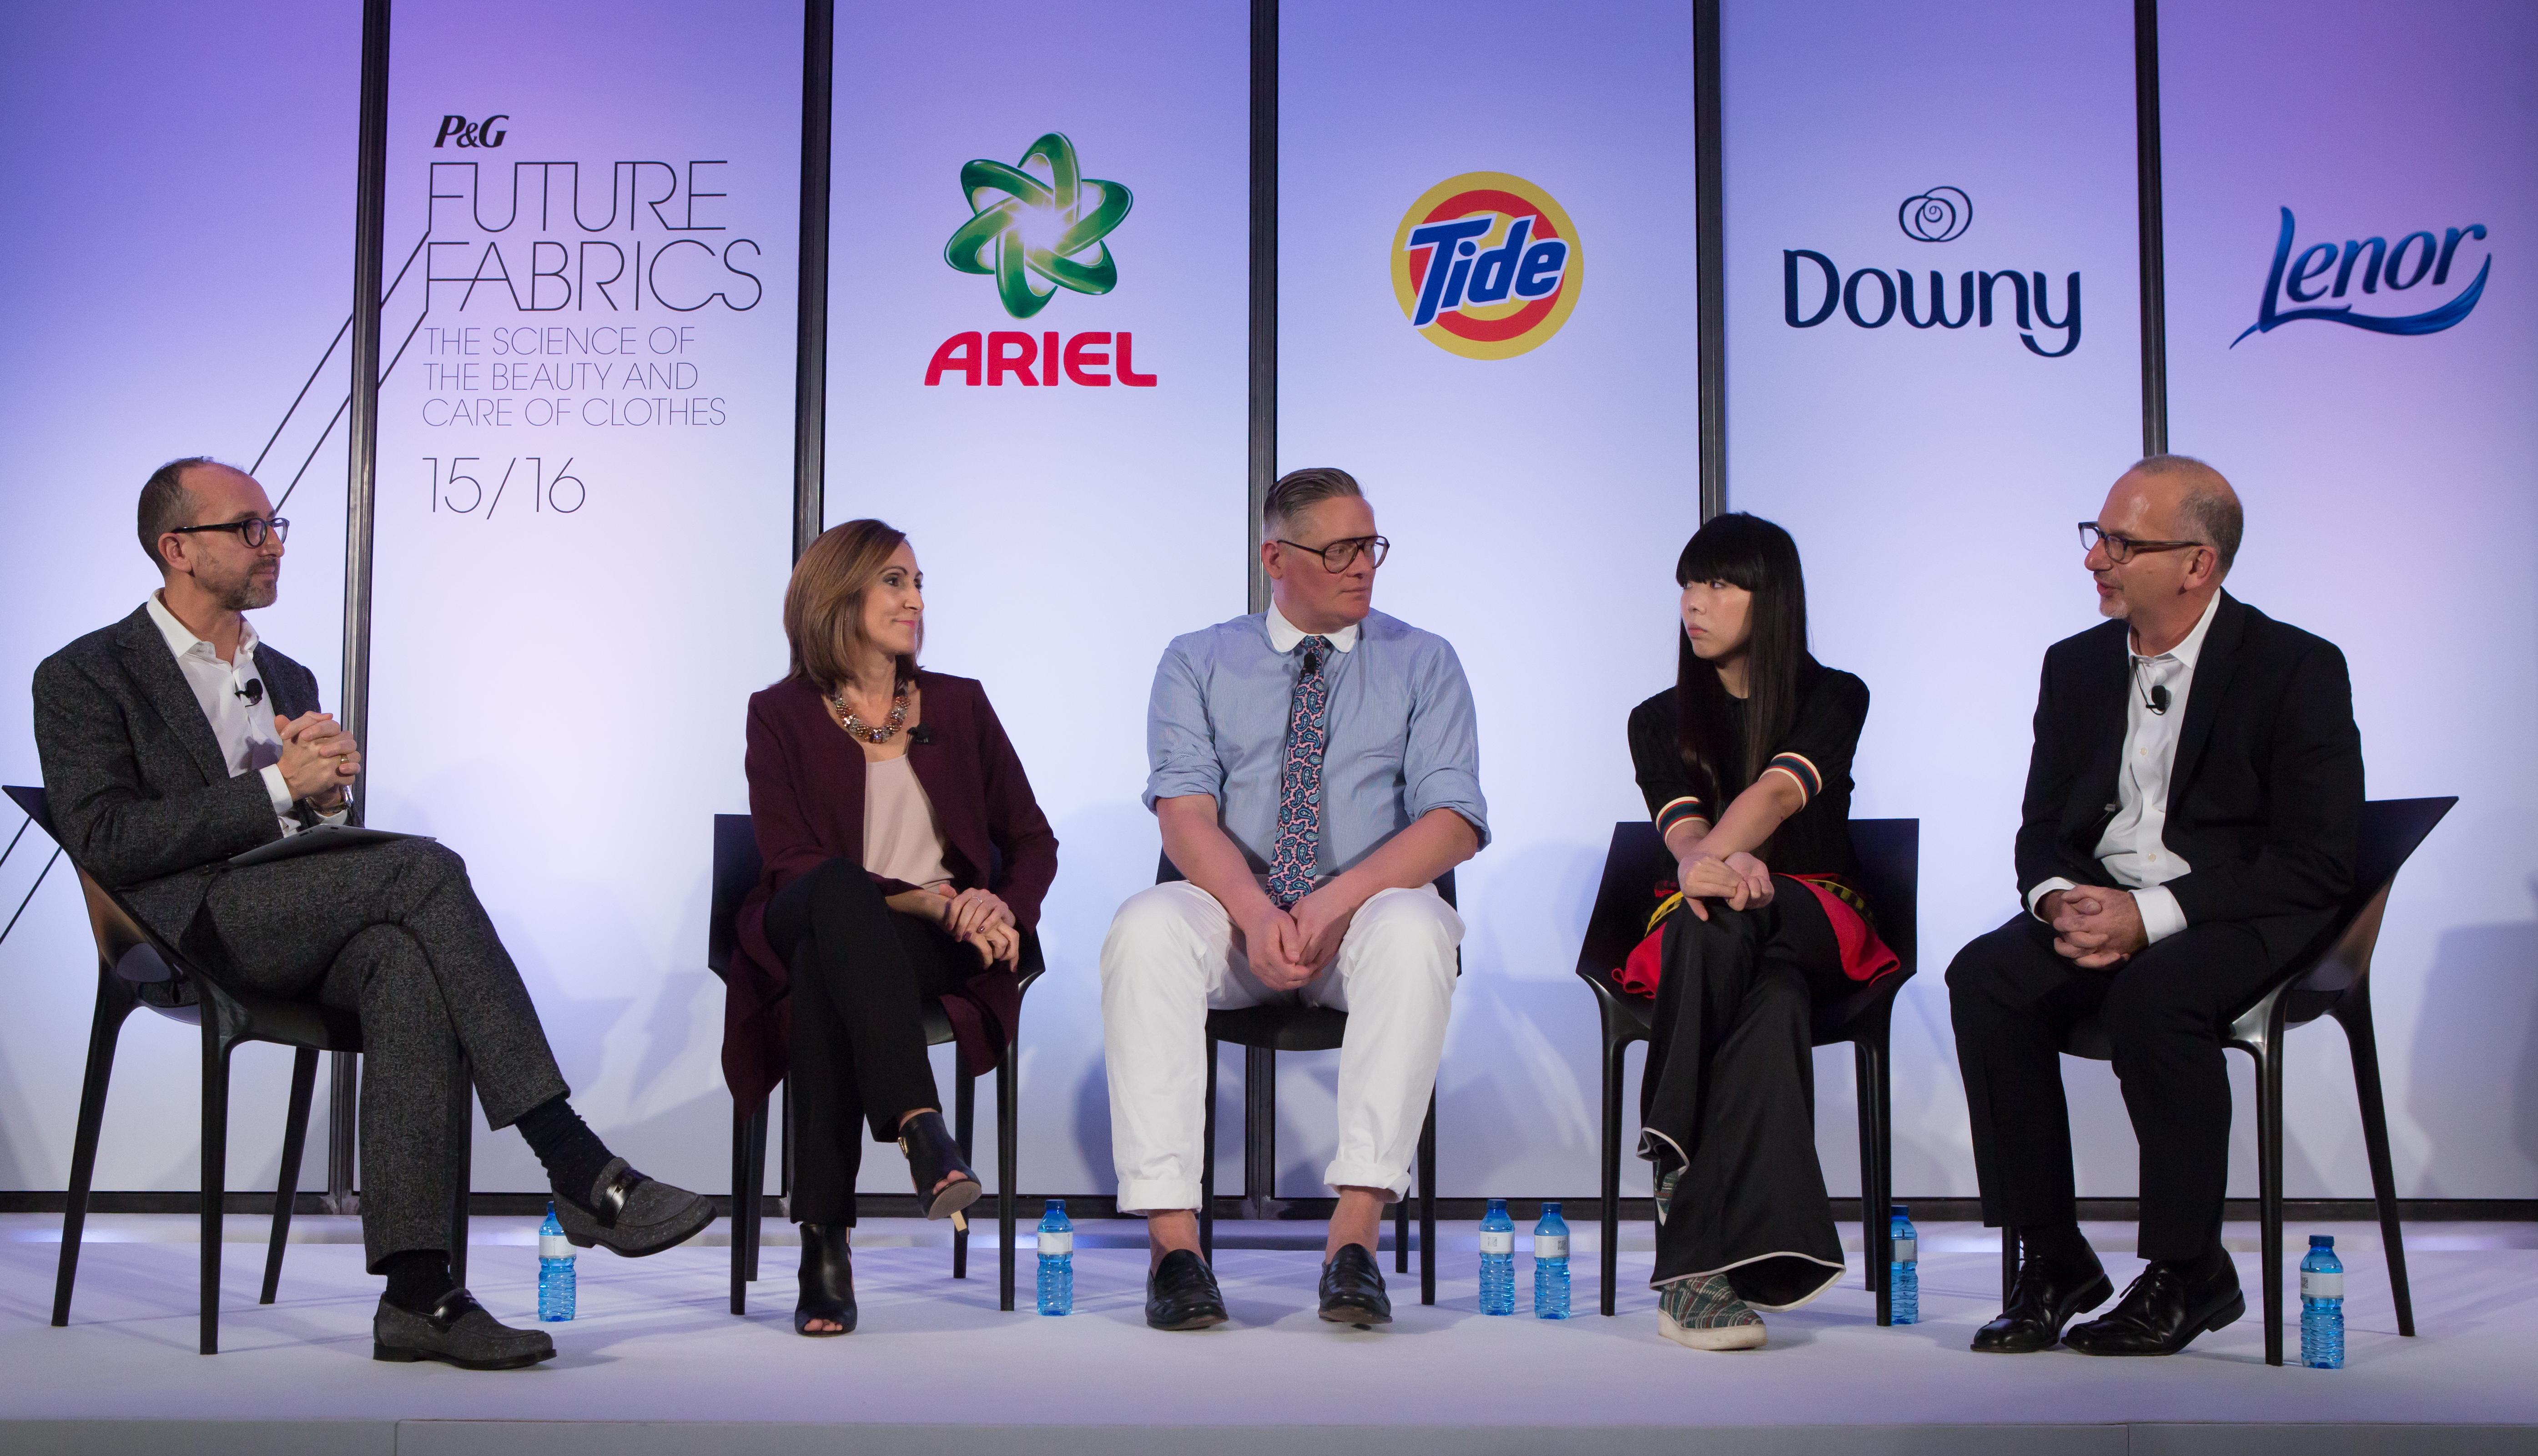 P&G FF 2015 Gianluca Longo, Margarita Bahrikeeton, Giles Deacon, Susie Bubble, Dr Rosenblum